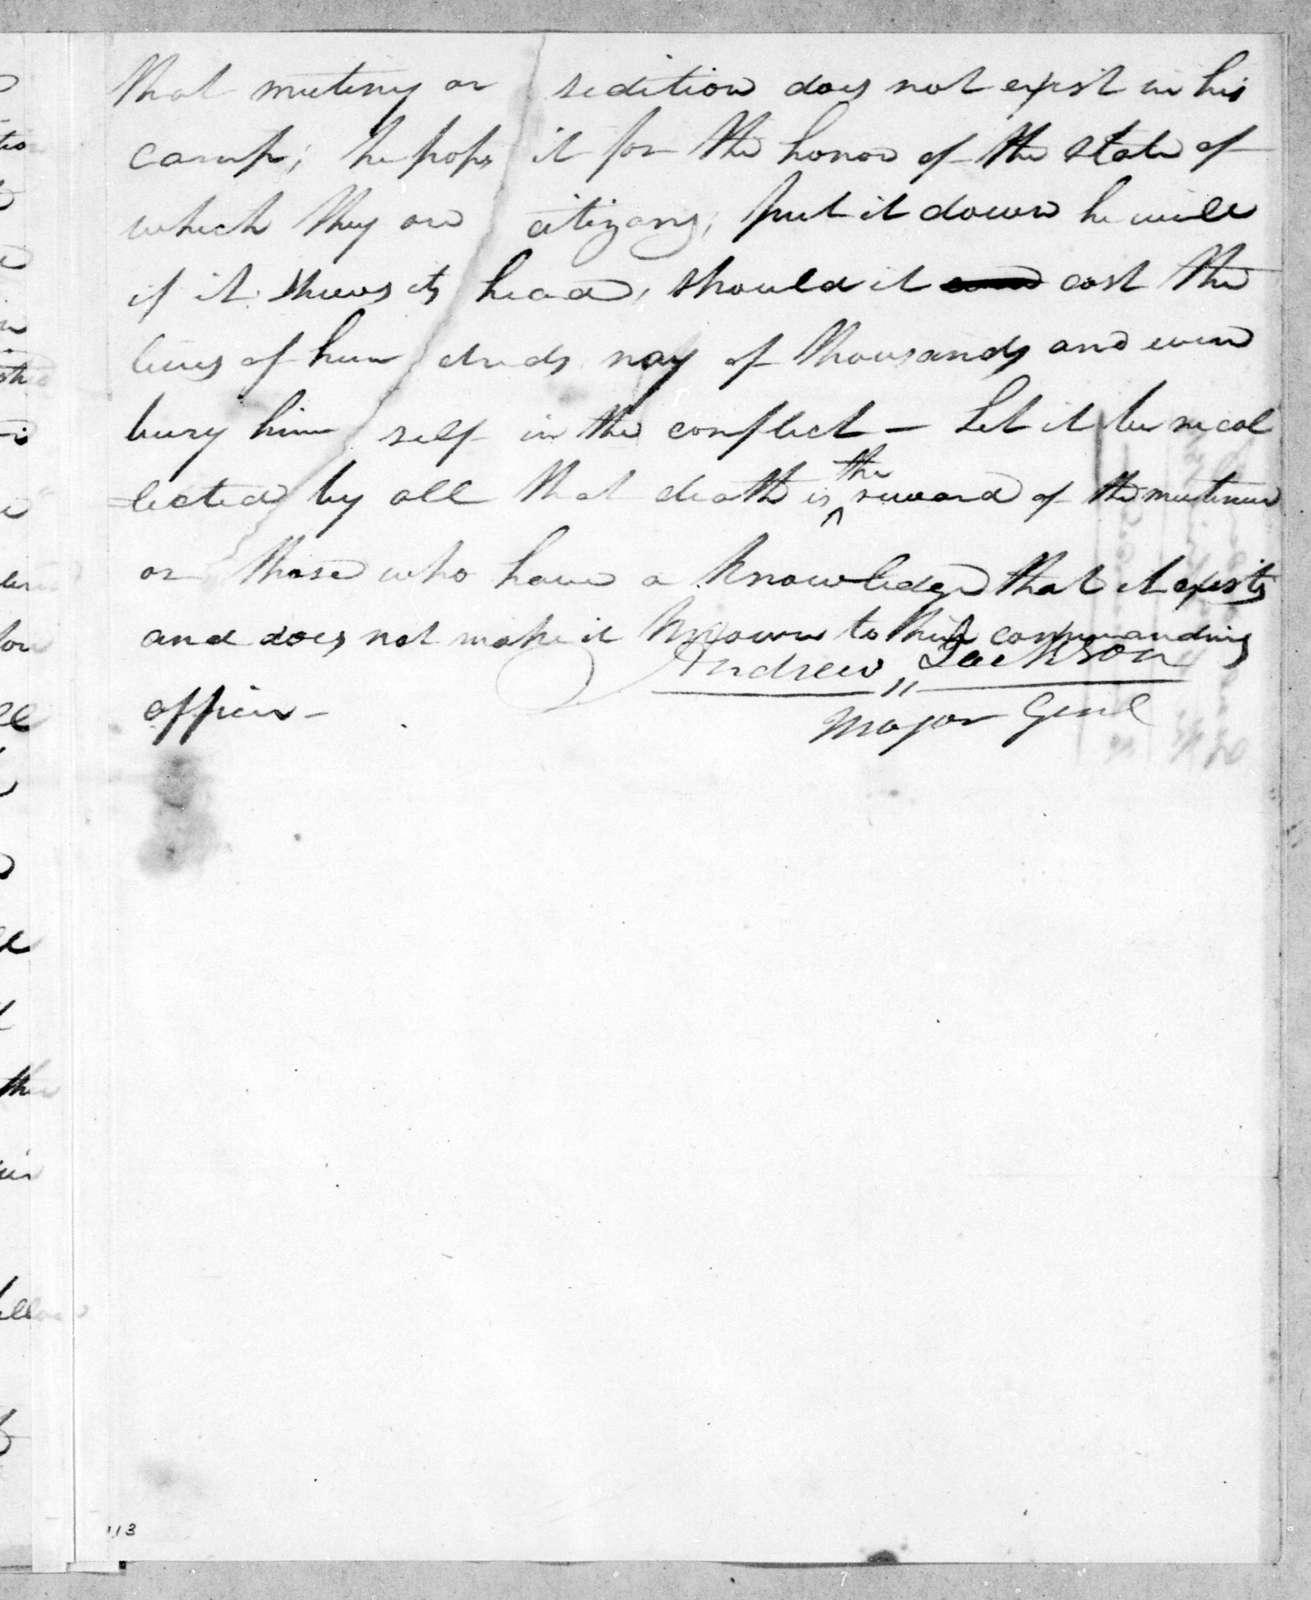 Andrew Jackson, April 4, 1814